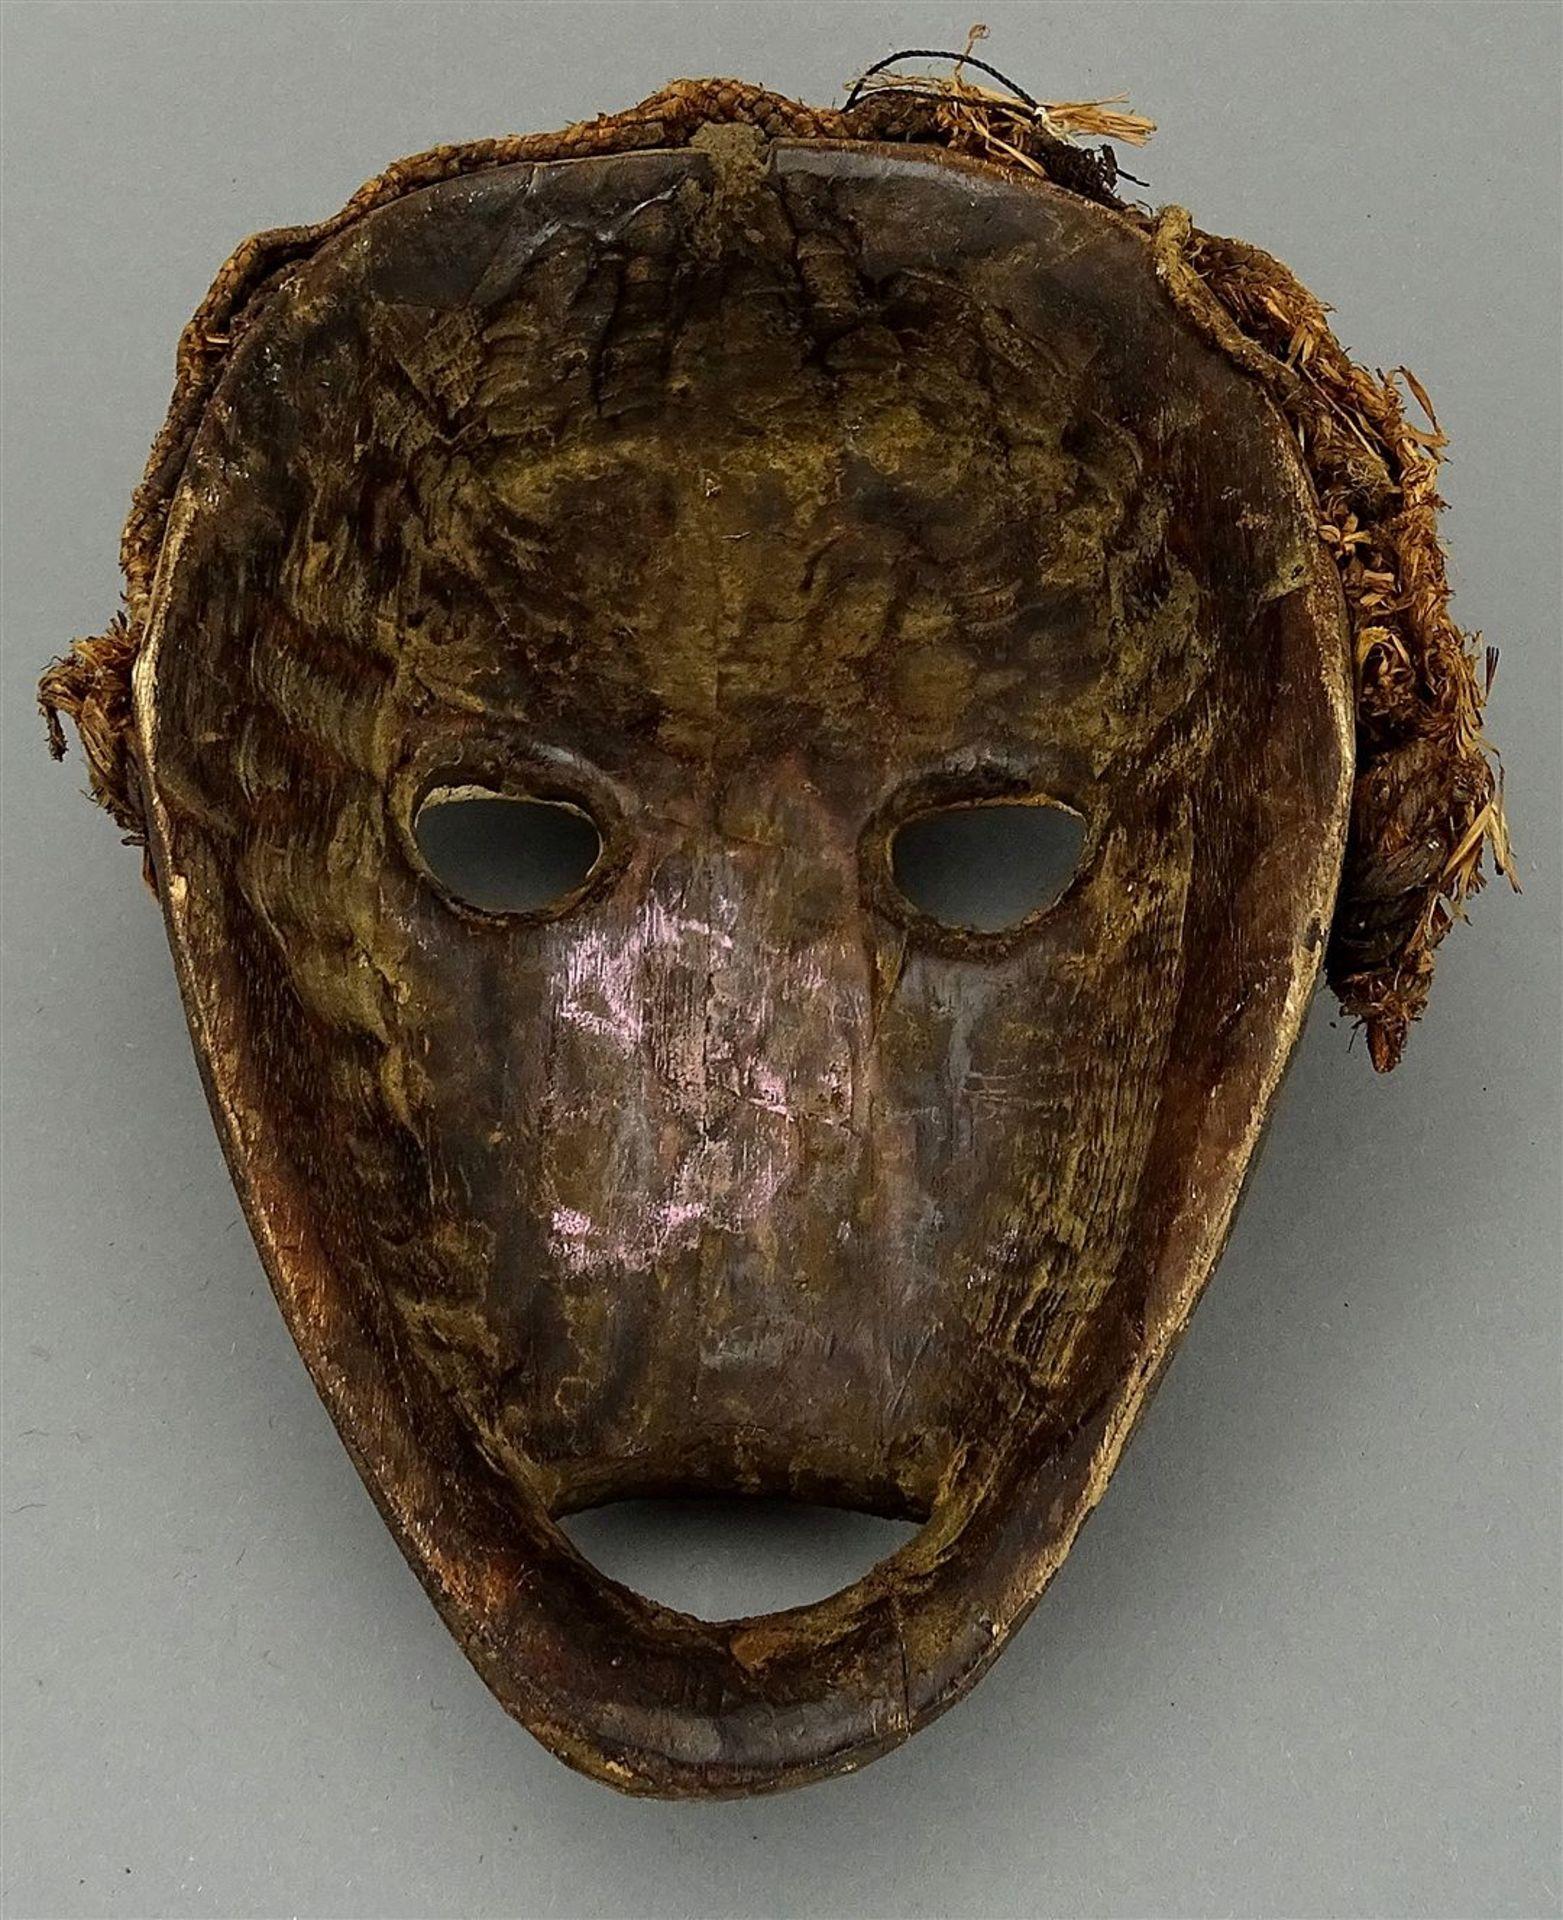 "Feuermeldermaske ""zakpai"", Dan, Liberia / Elfenbeinküste (Côte d'Ivoire) - Bild 2 aus 2"